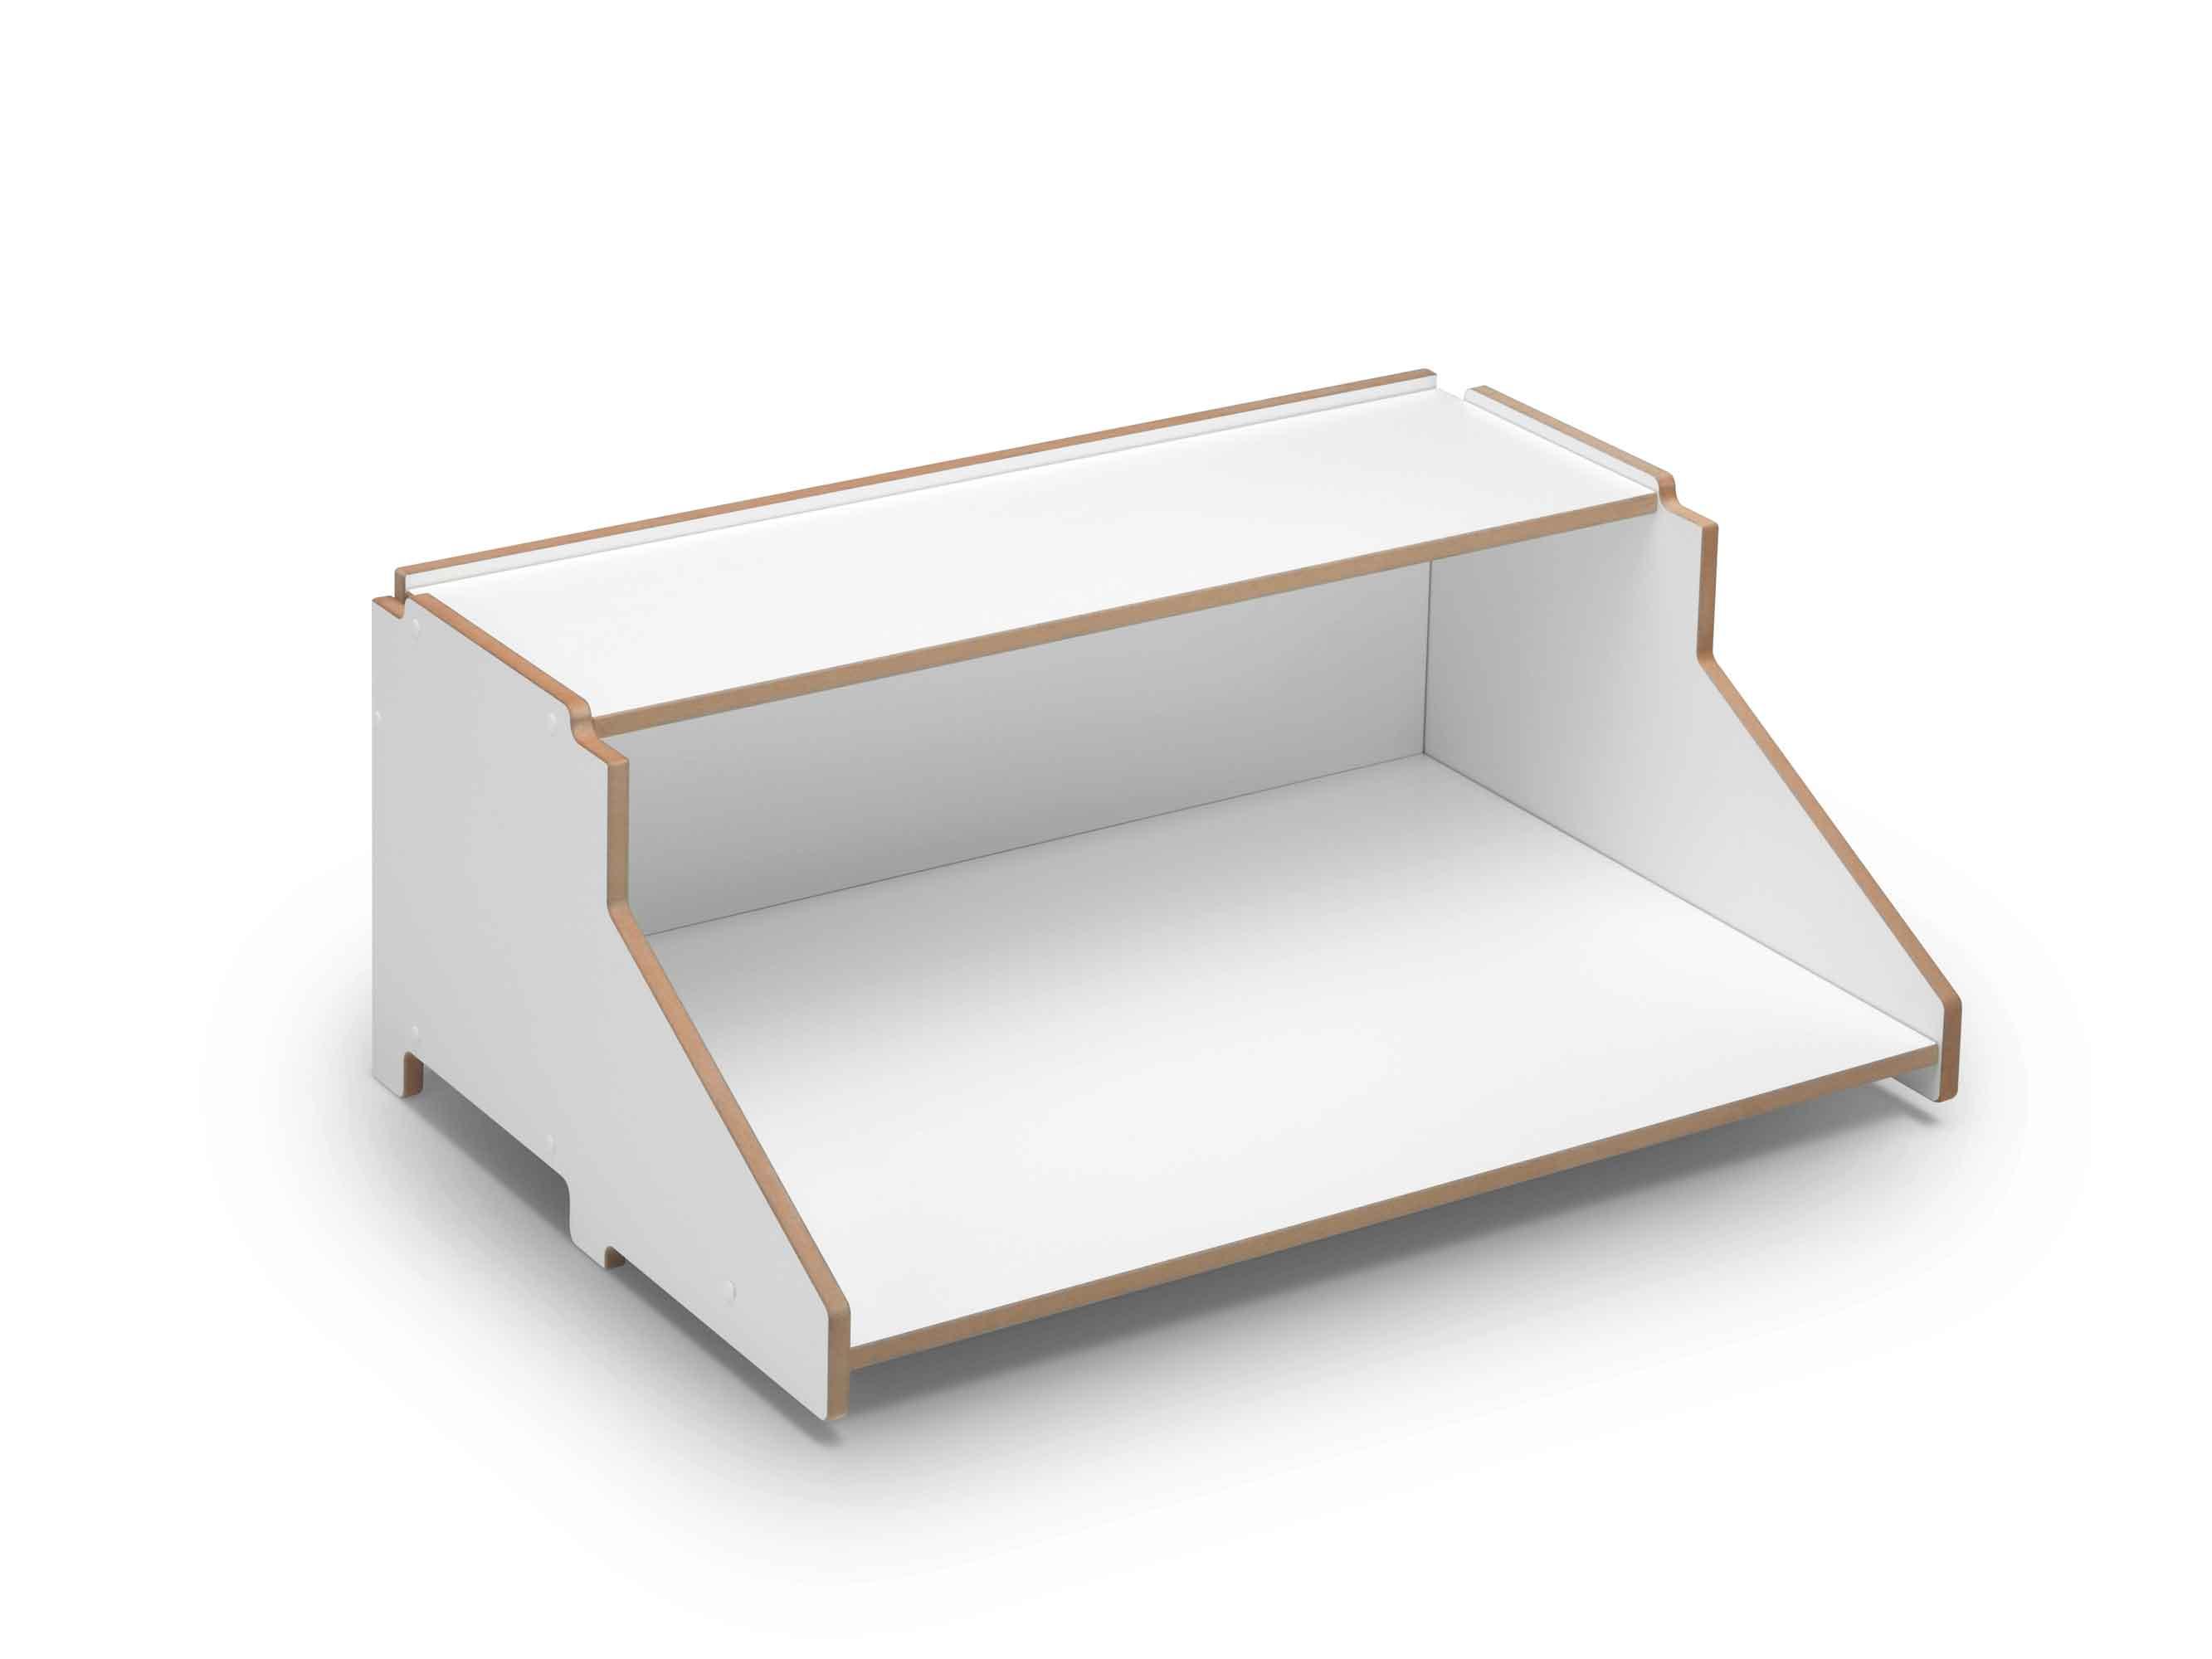 harry schreibsekret r aufsatz f r regale 33 5cm tief country living shop. Black Bedroom Furniture Sets. Home Design Ideas